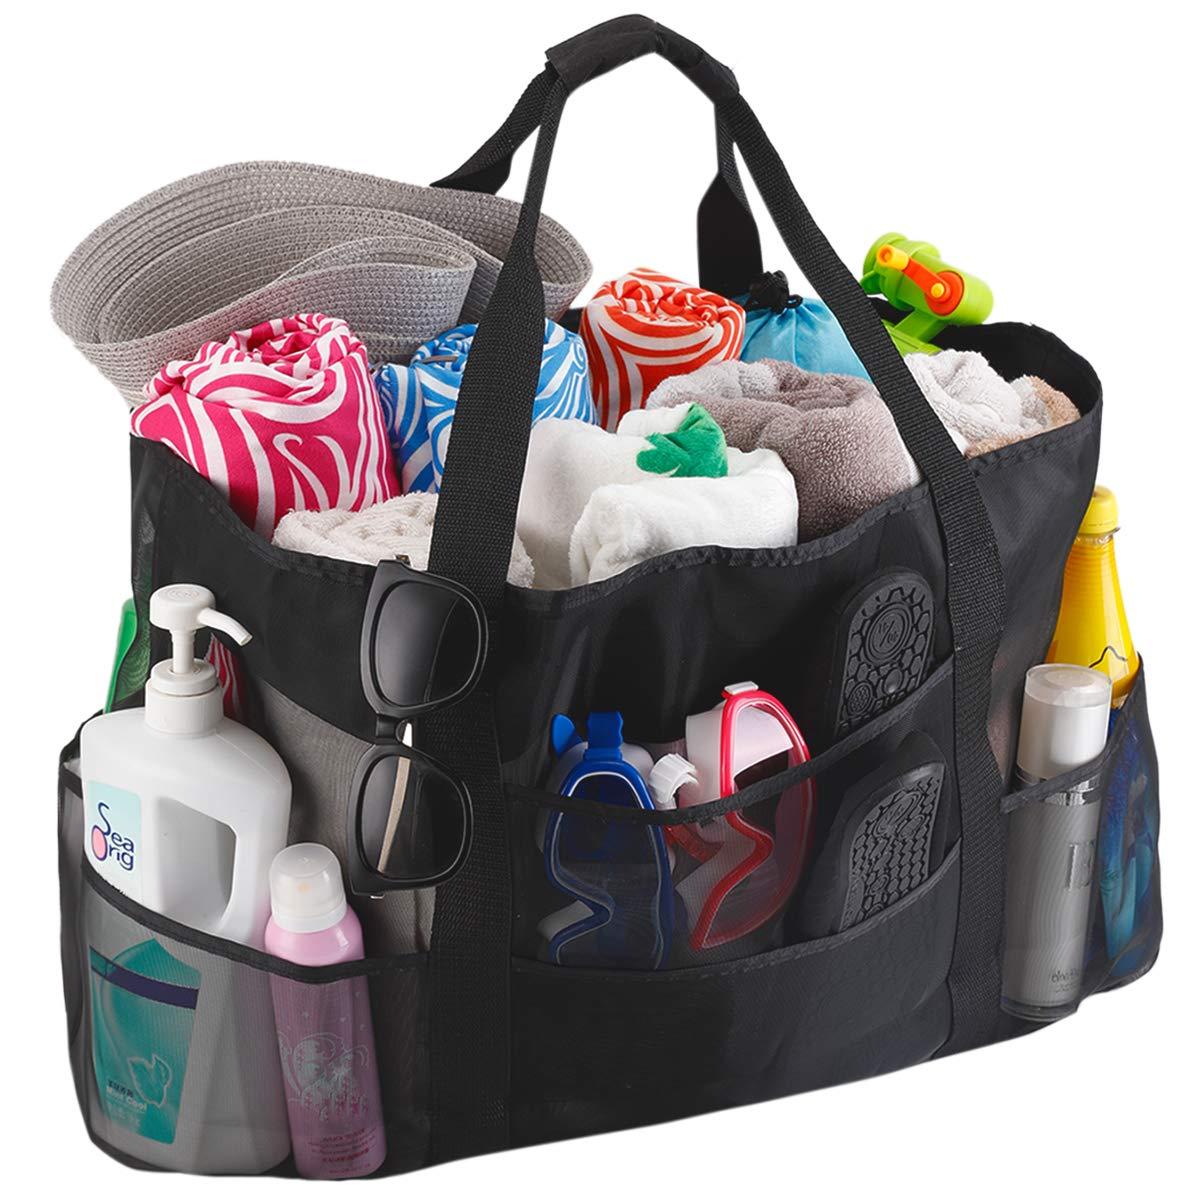 Fundia Extra Large Beach Bags and Totes XXL Mesh Beach Bag